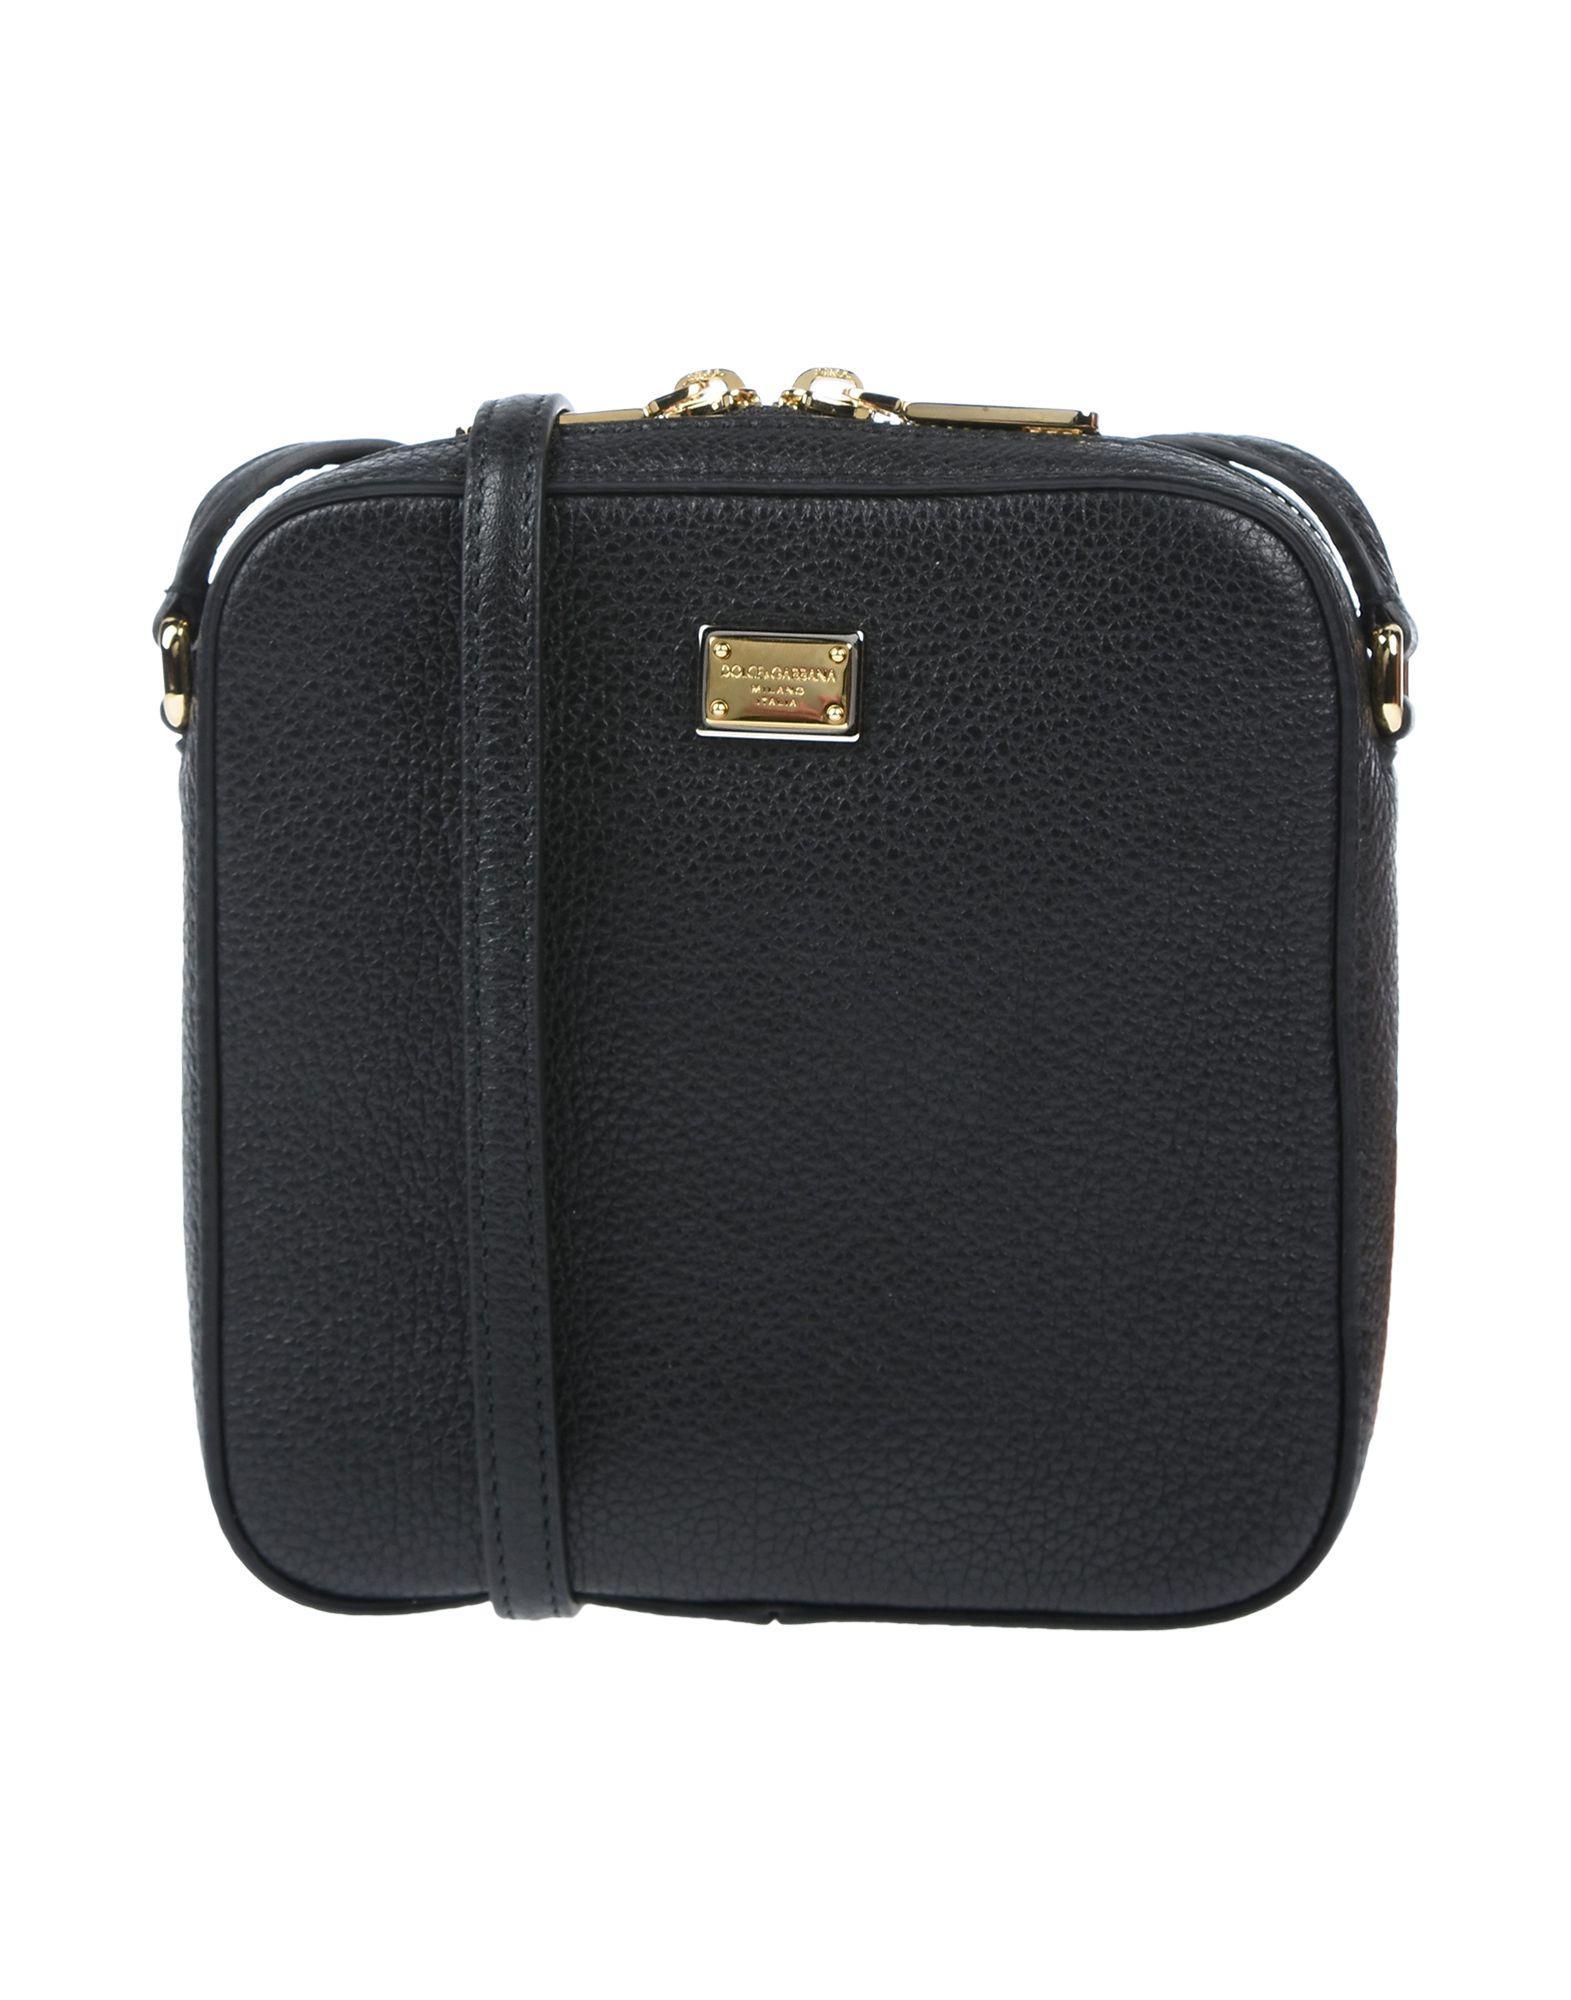 82536379b02c Dolce   Gabbana Cross-body Bag in Black - Lyst